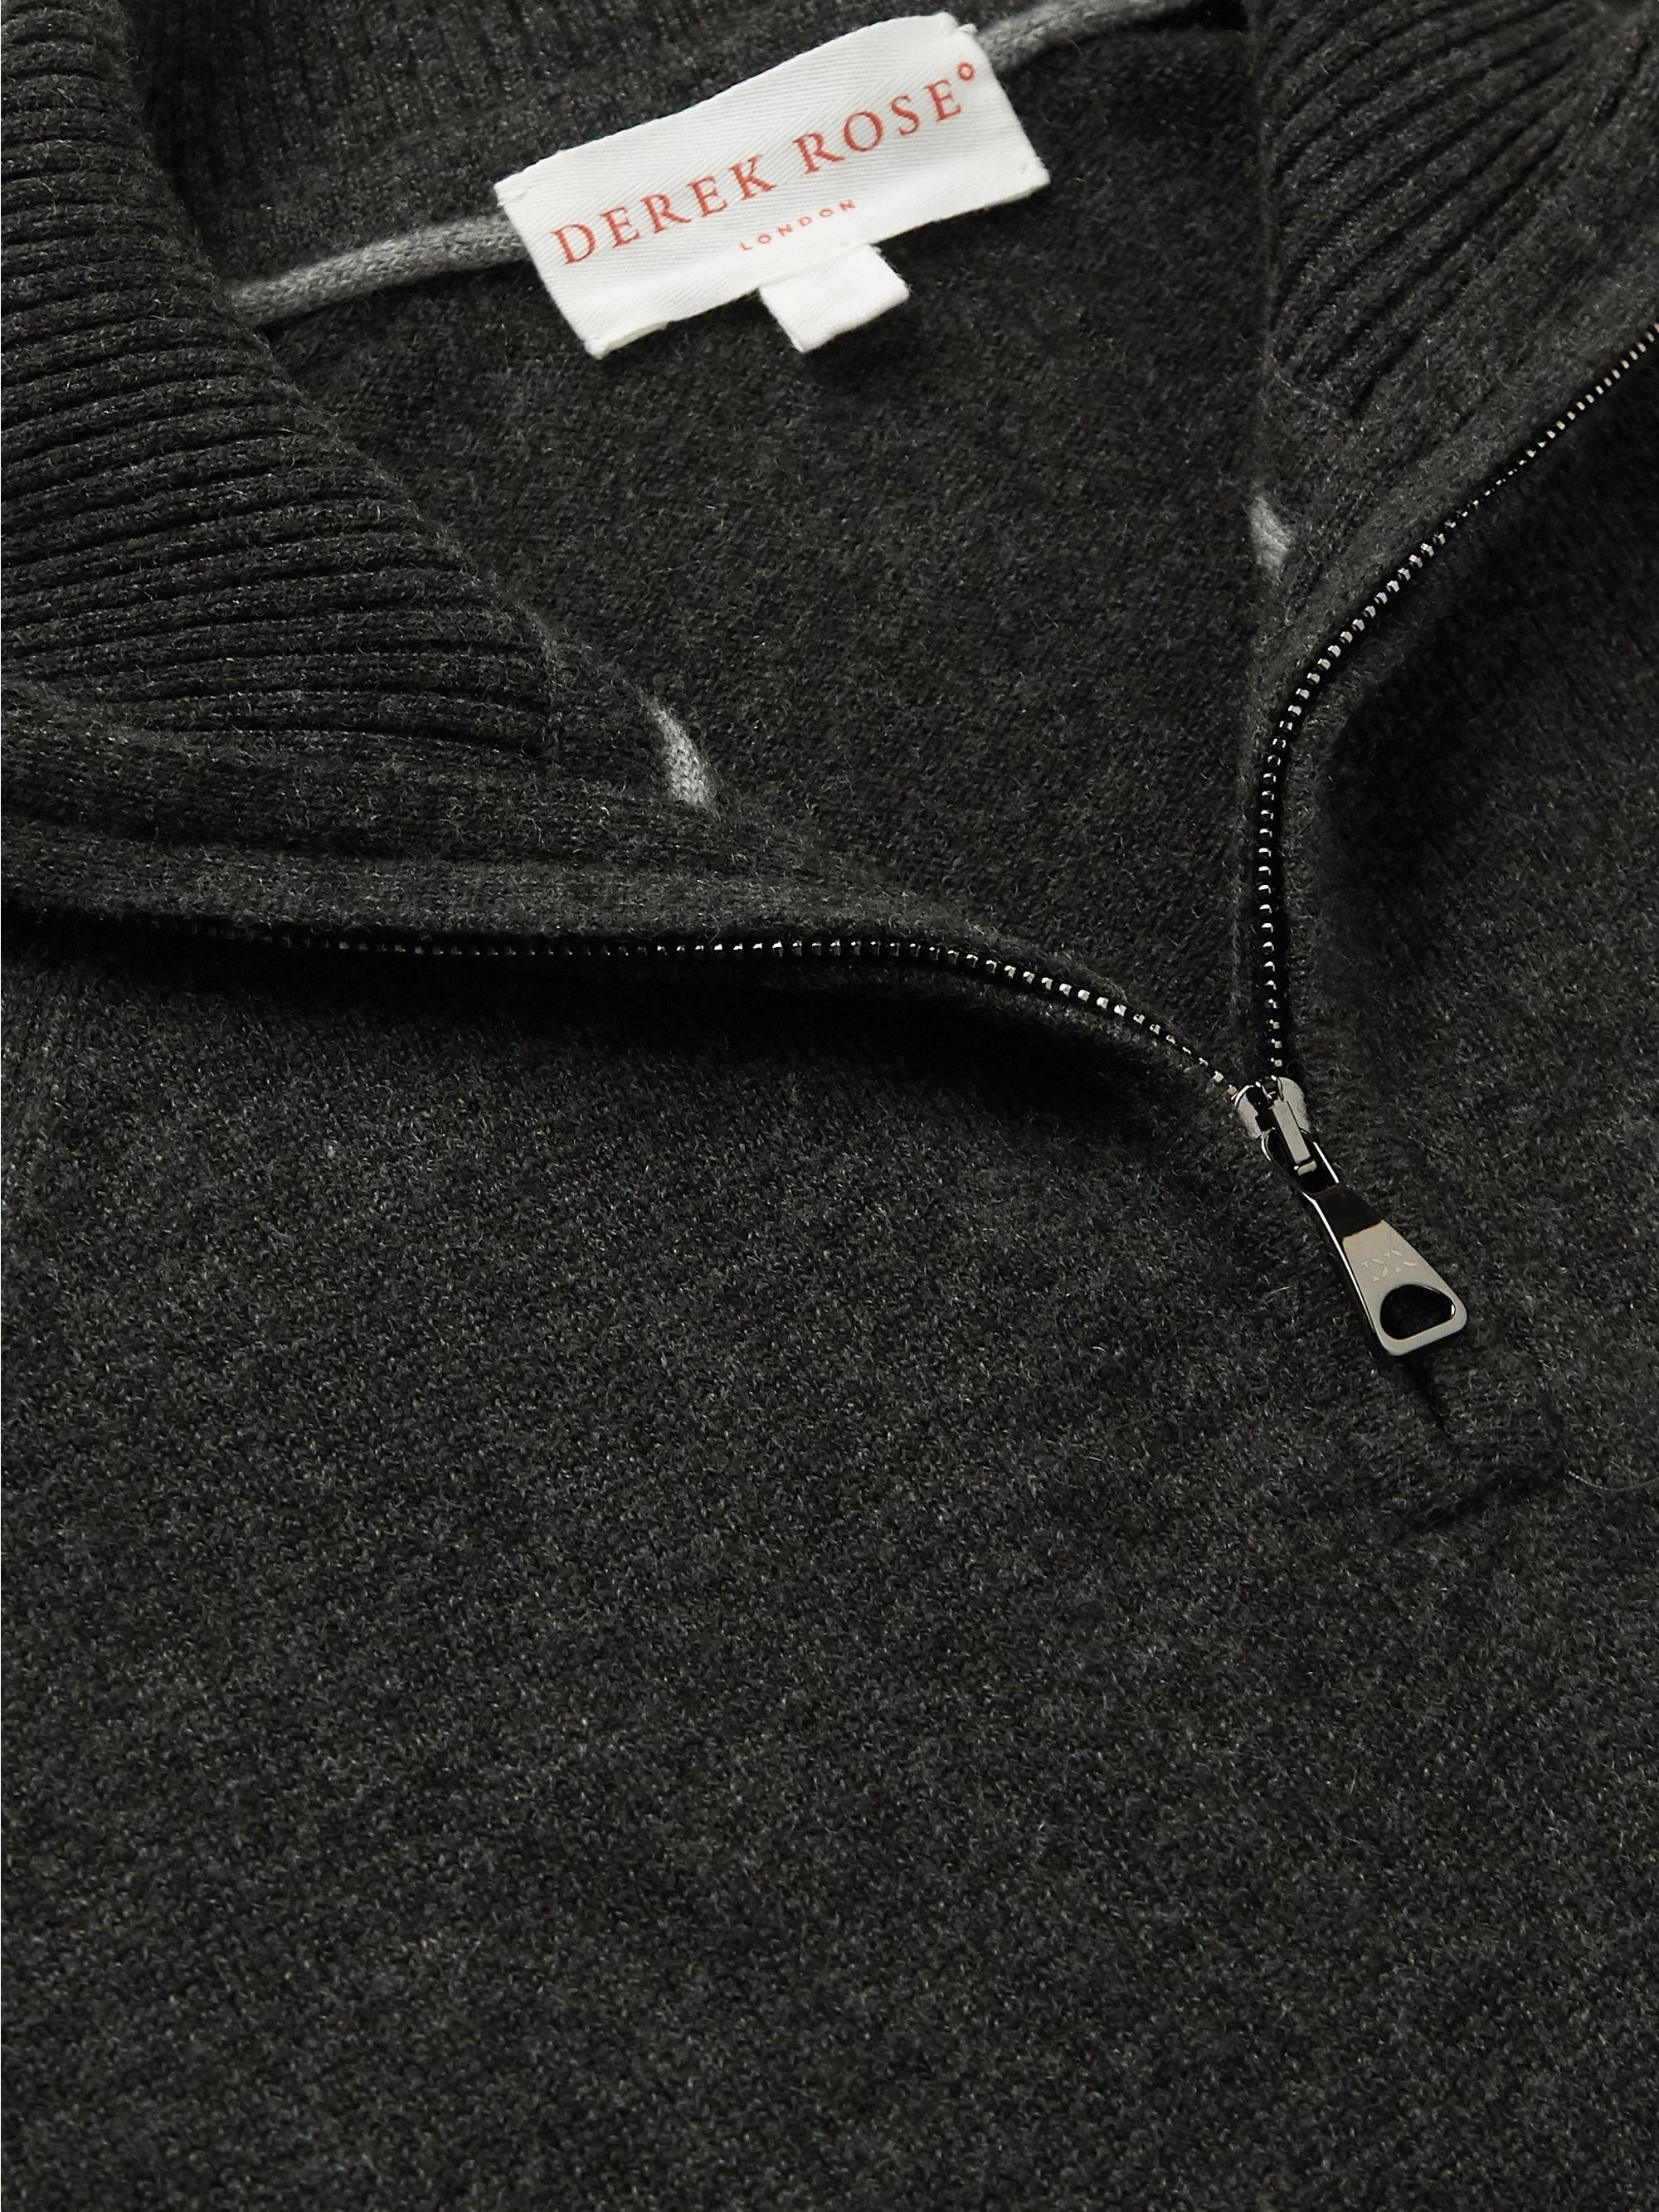 Charcoal Finley 2 Cashmere Half-zip Sweater | Derek Rose